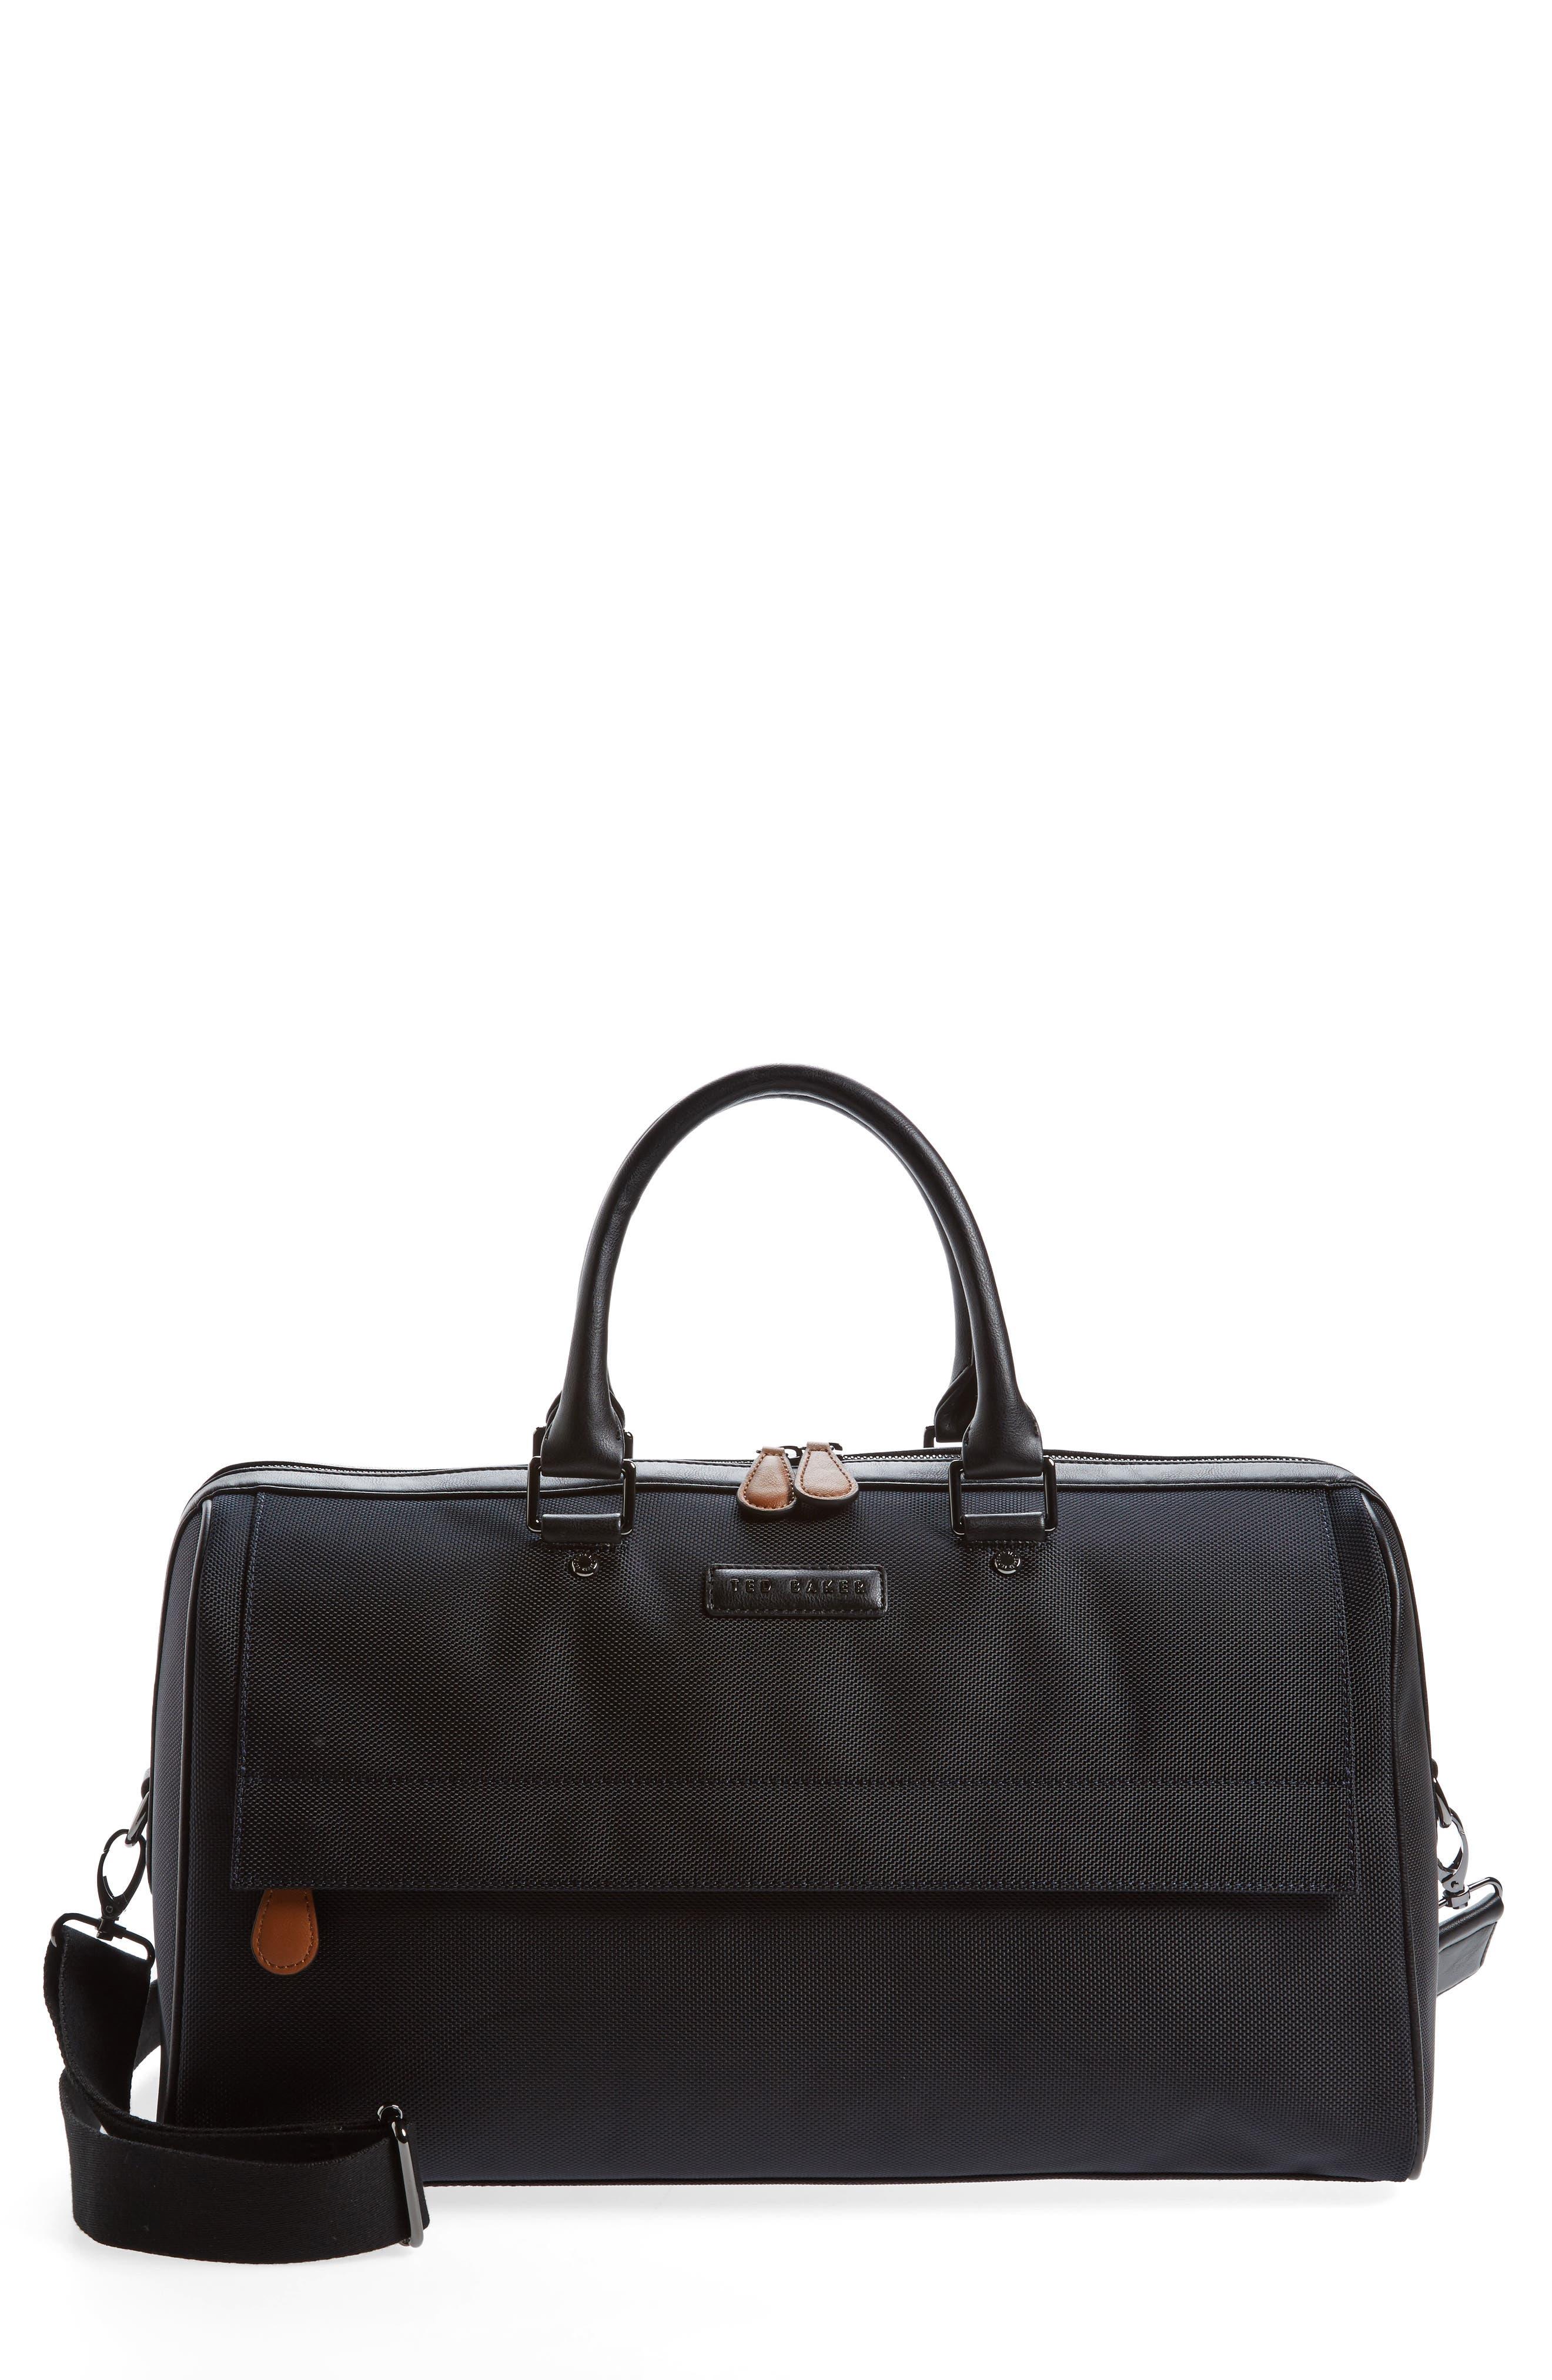 Soylant Duffel Bag,                         Main,                         color, 410